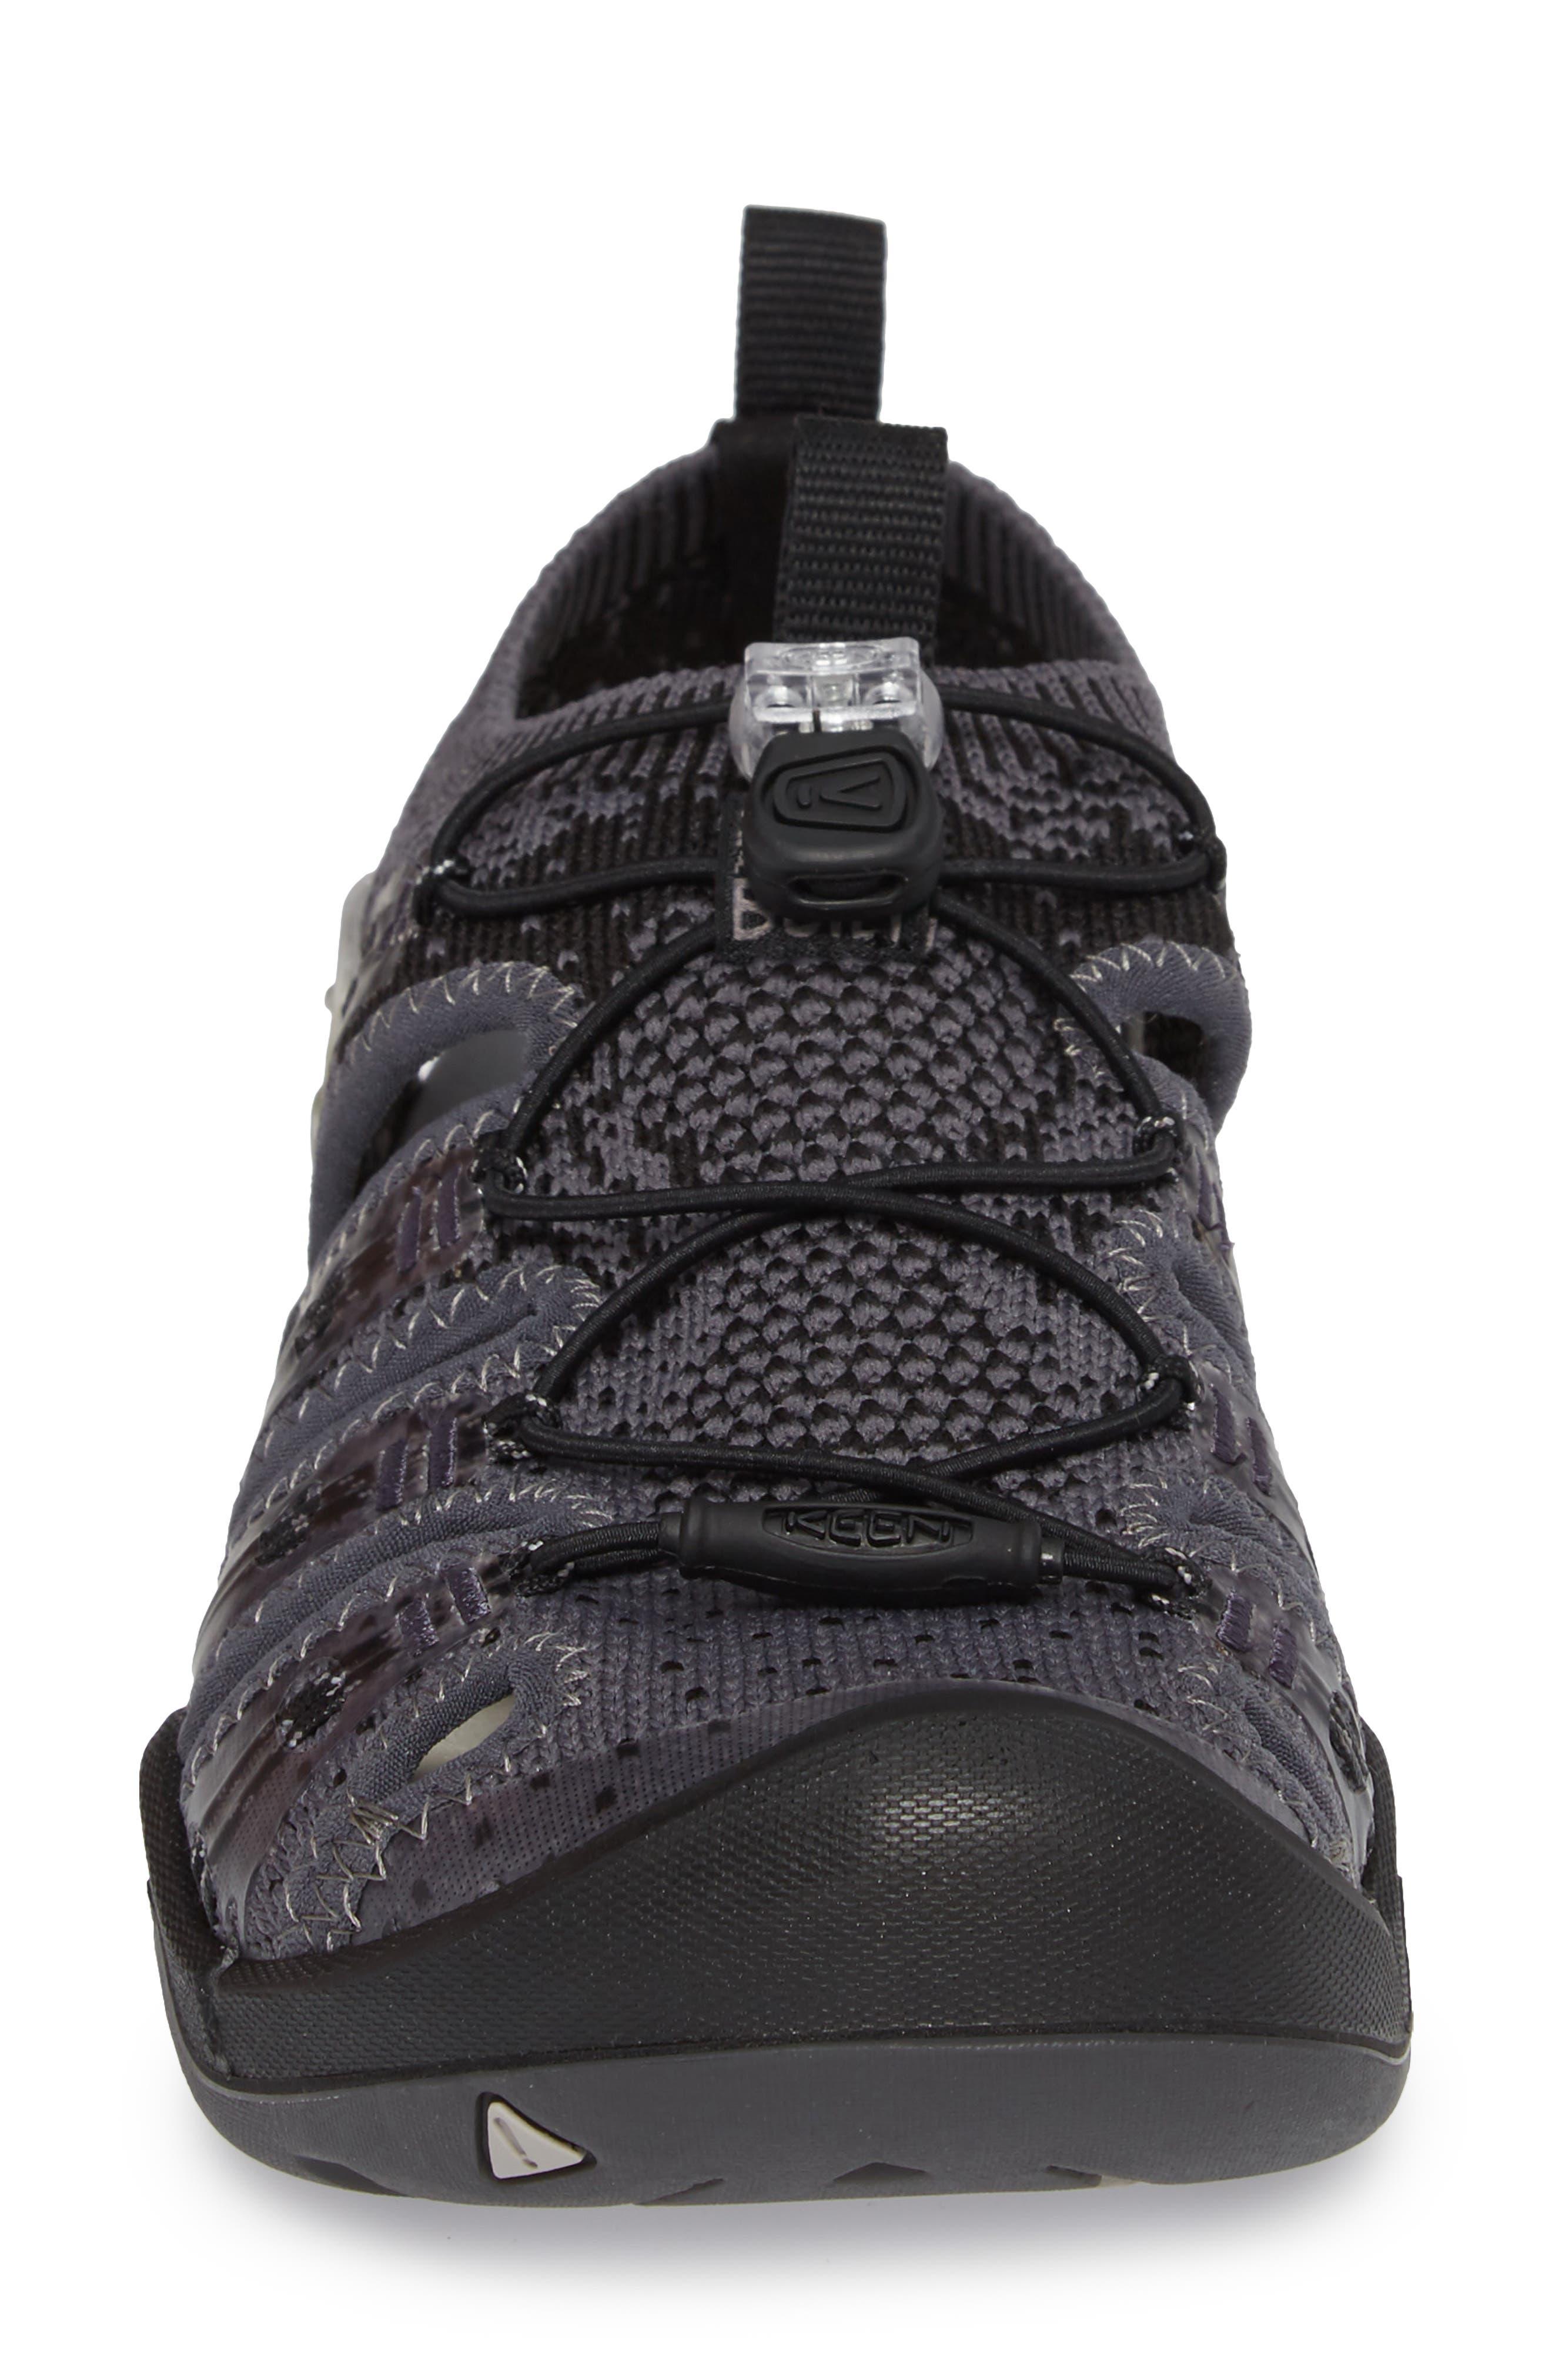 EVOFIT One Sandal,                             Alternate thumbnail 4, color,                             Heathered Black/ Magnet